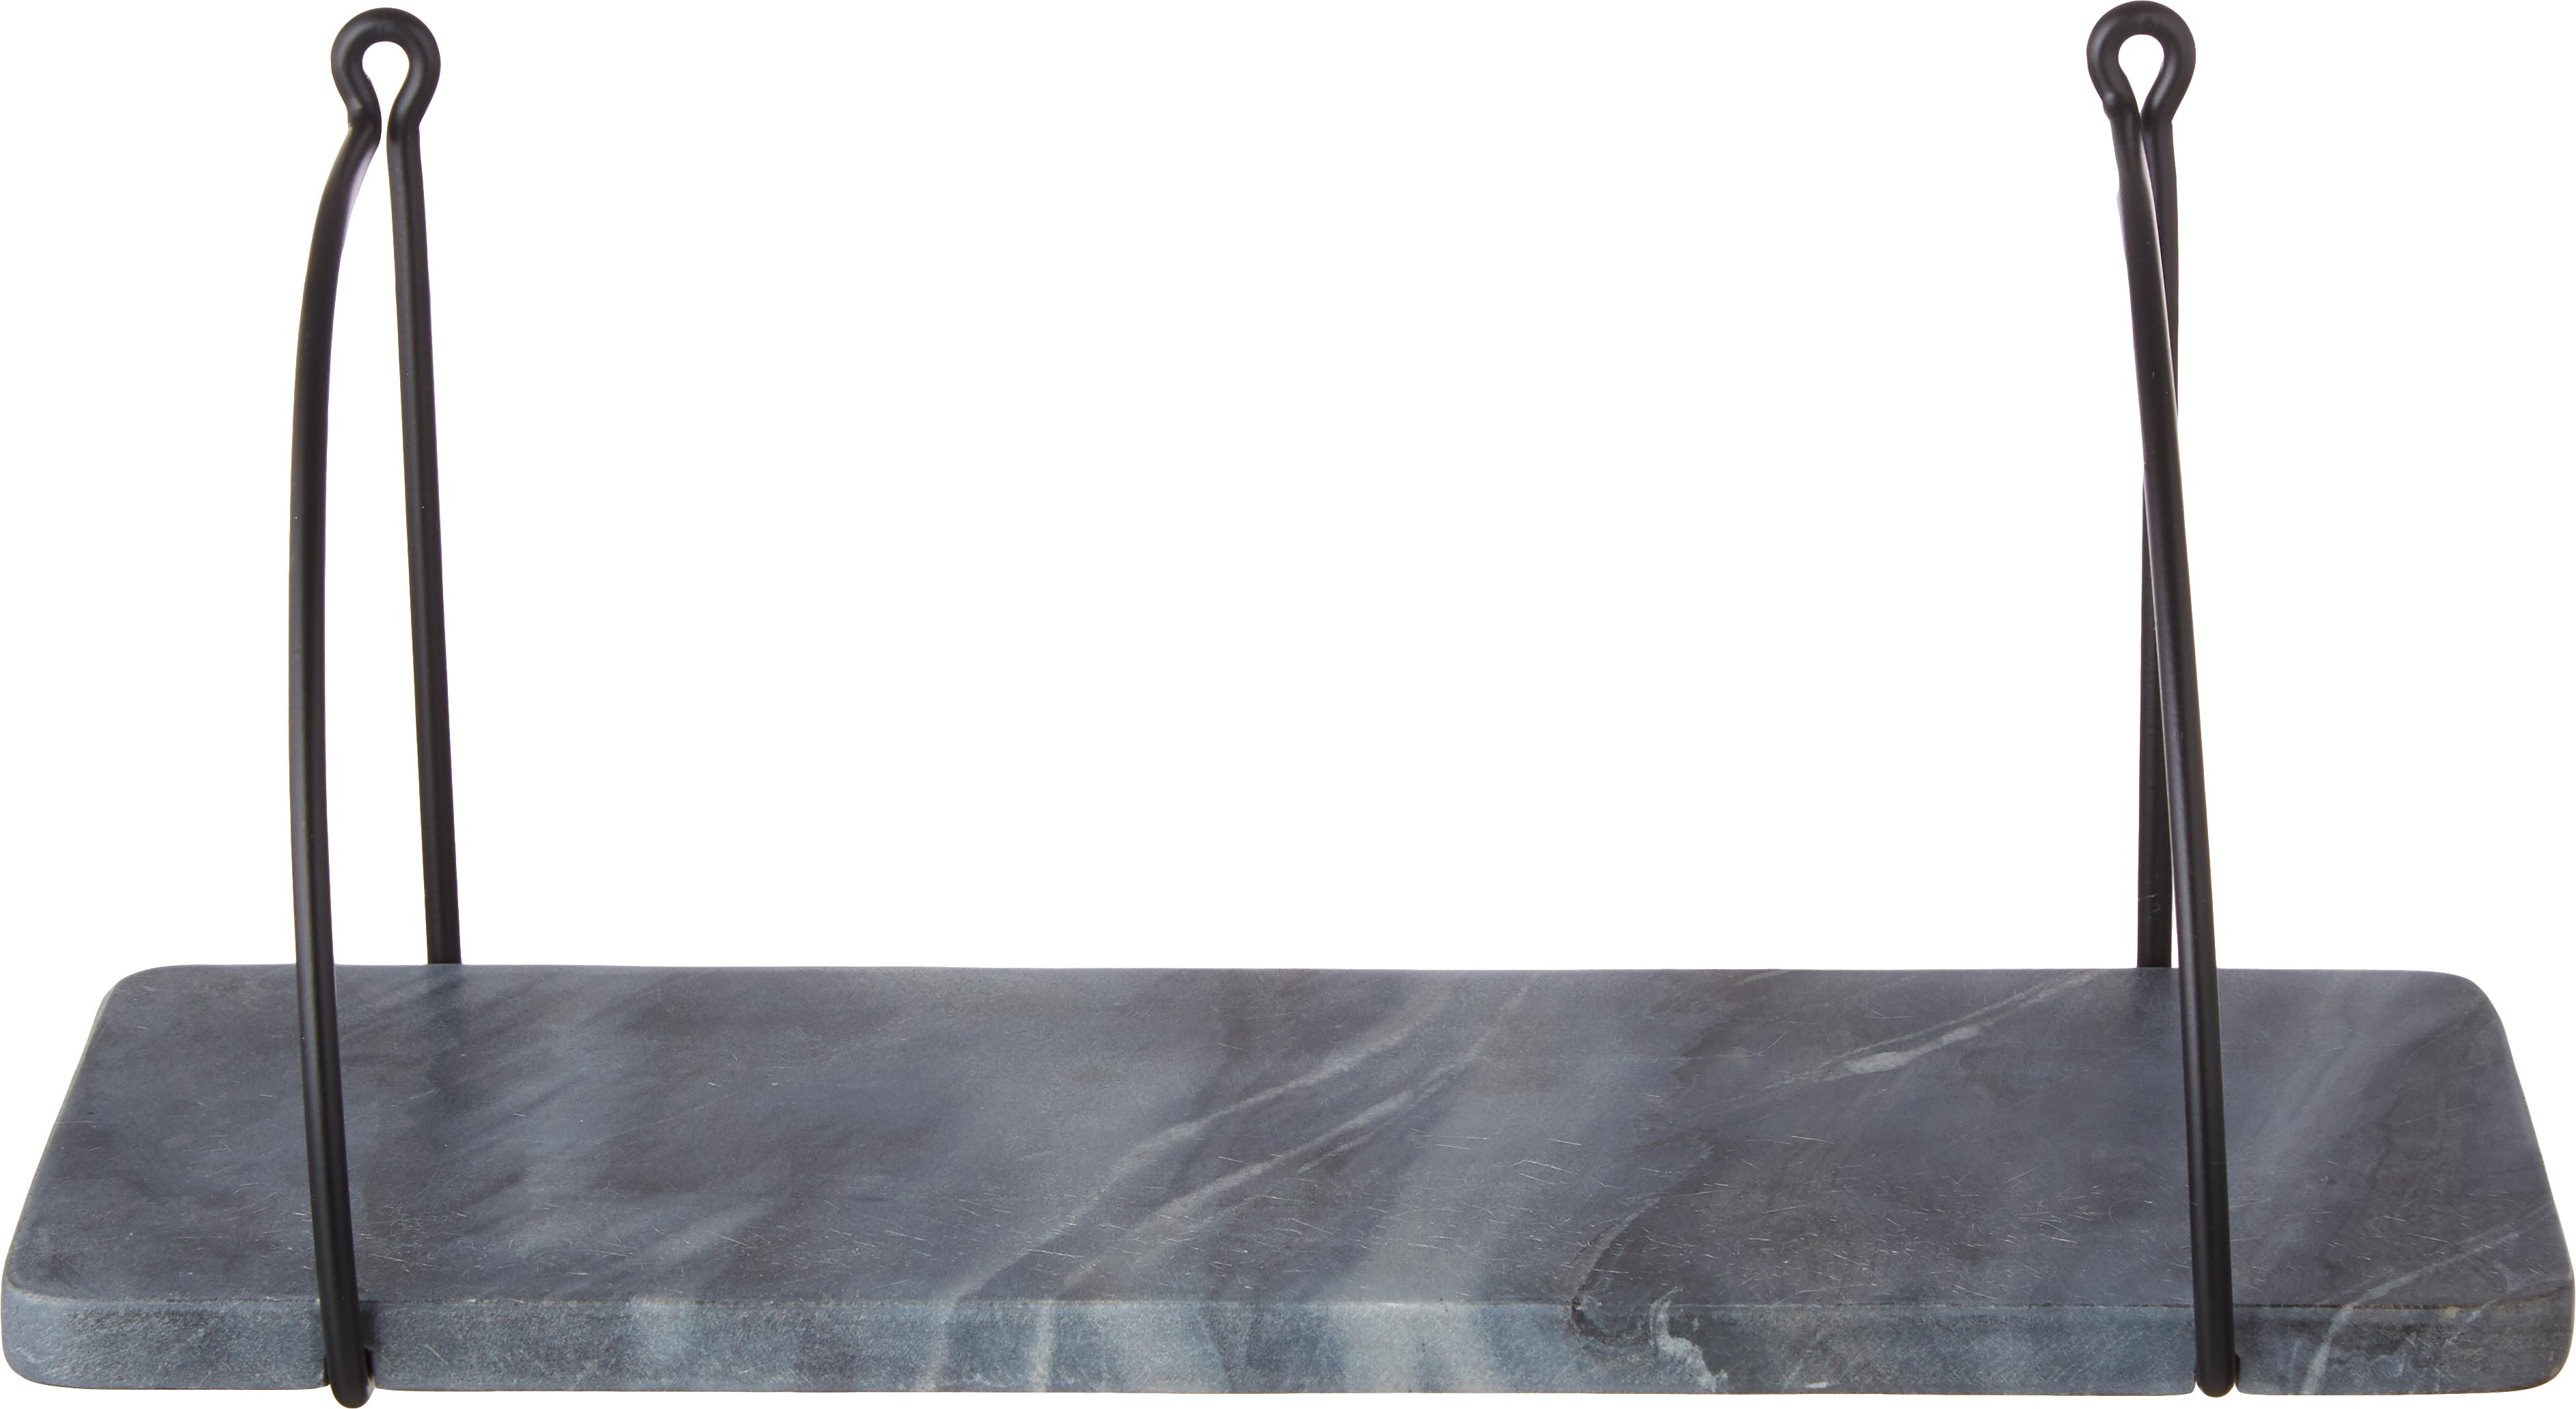 Marmeren wandplank Porter, Plank: marmer, Wandbevestiging: zwart. Plank: gemarmerd grijs, B 40 cm